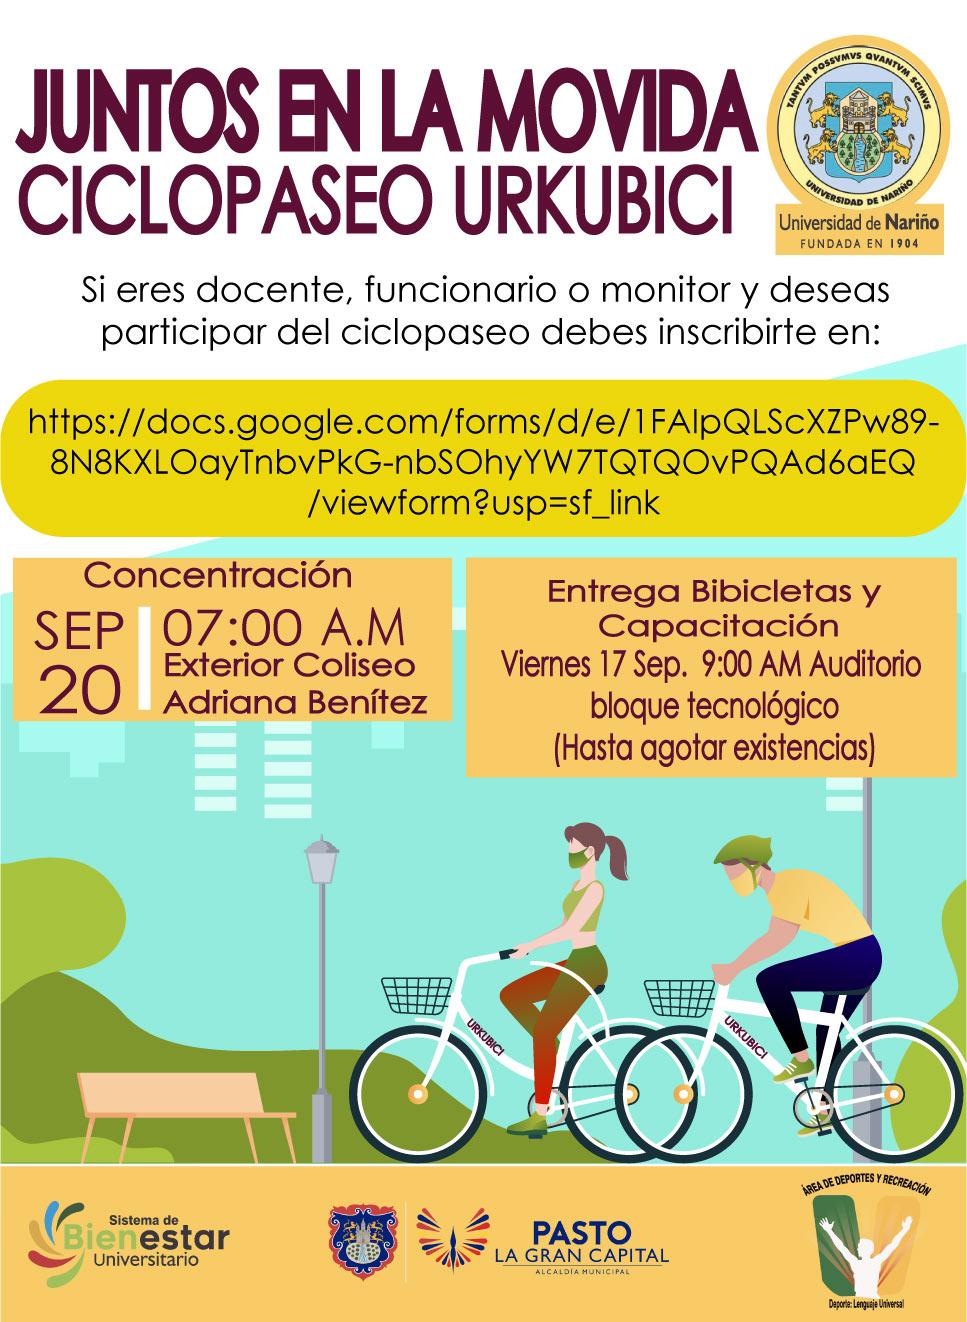 ciclopaseo-urkubici